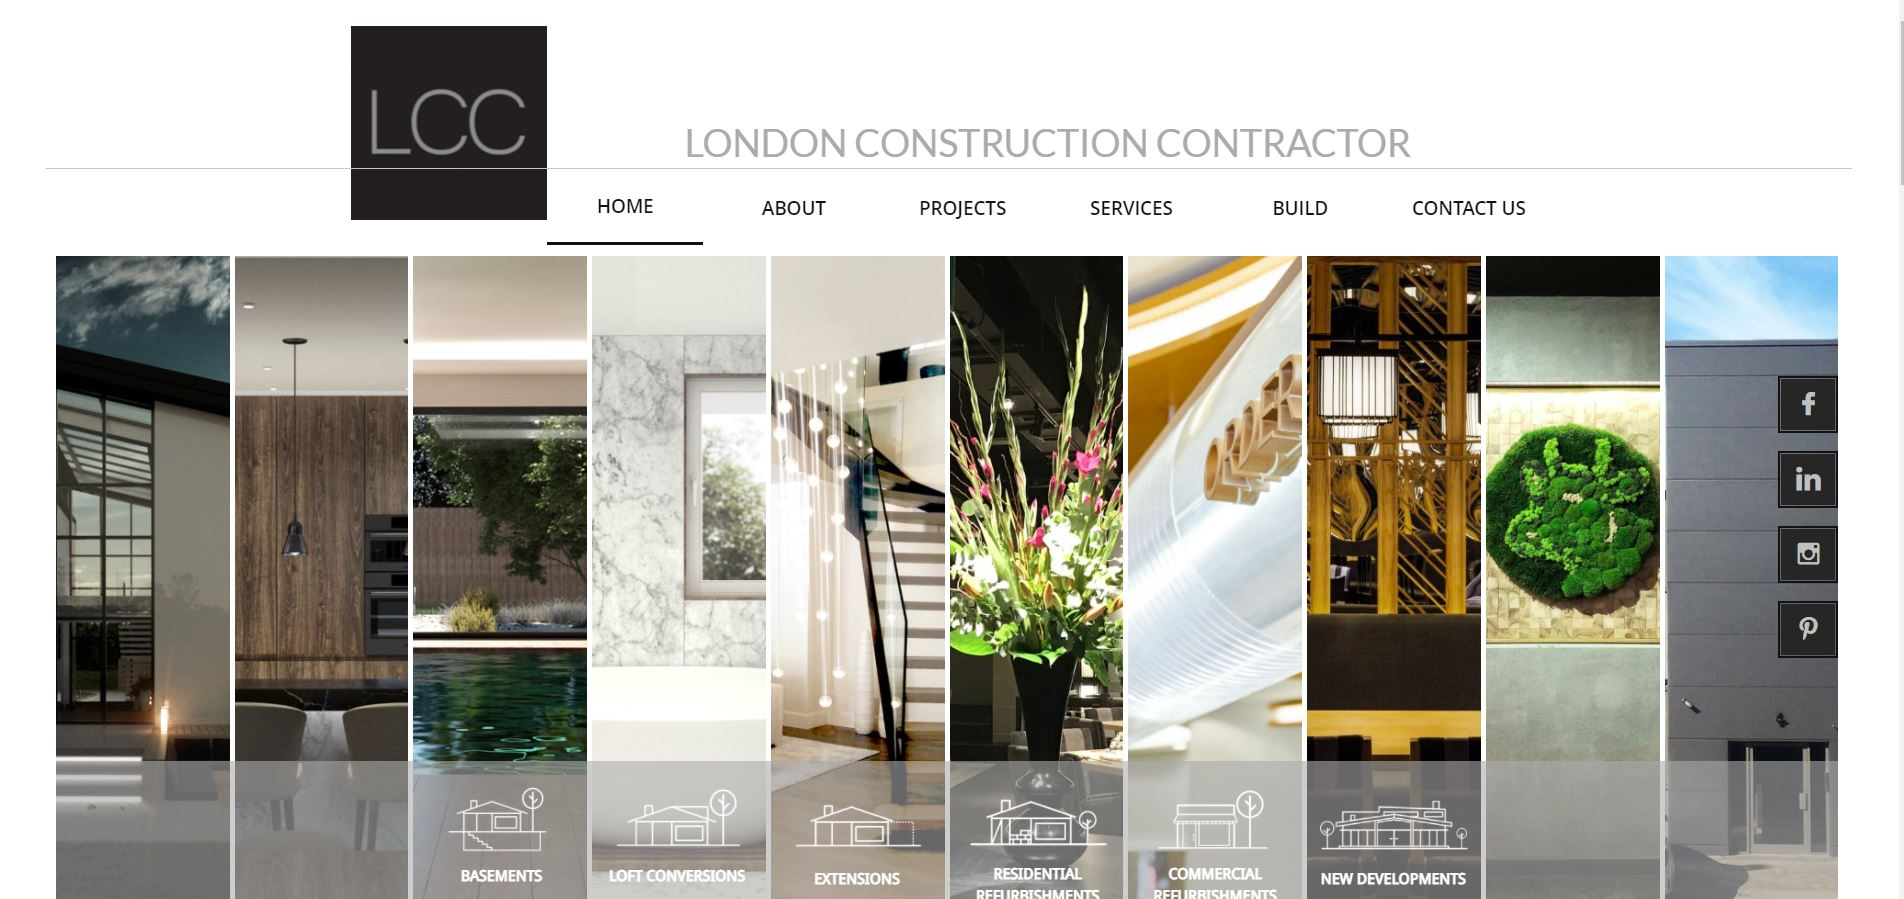 London Construction Contractor